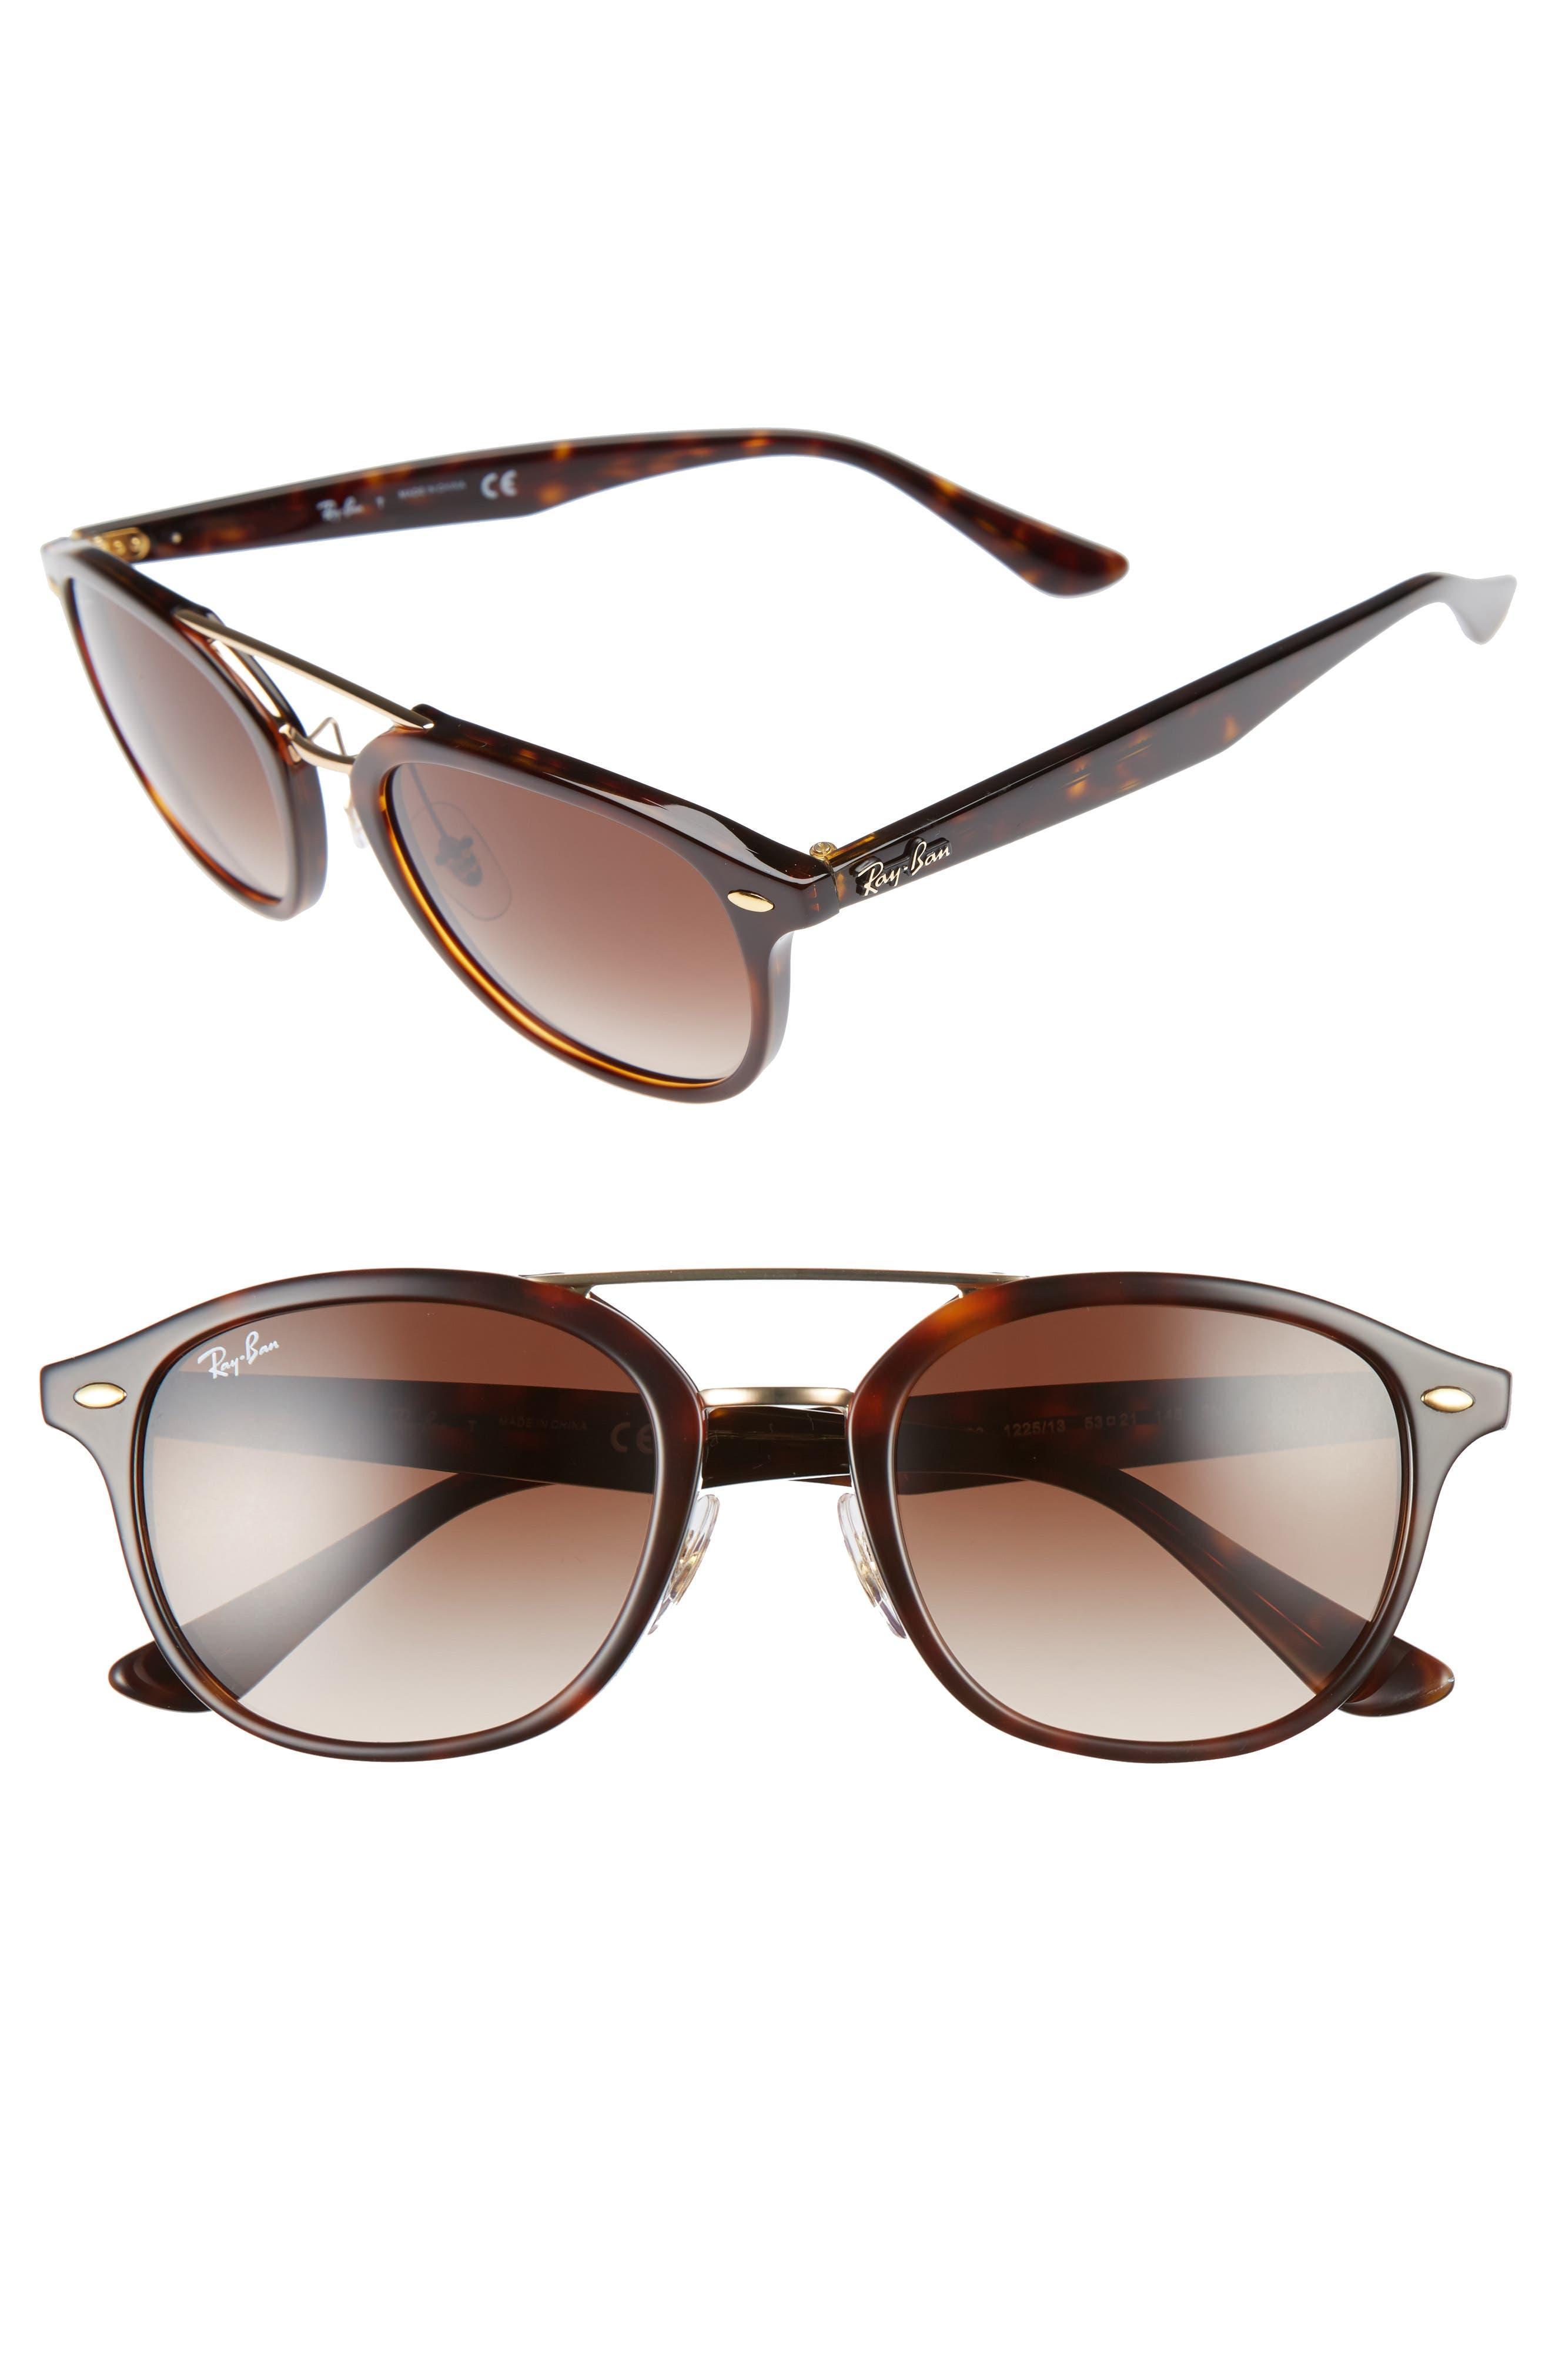 Ray-Ban Highstreet 53mm Gradient Lens Sunglasses